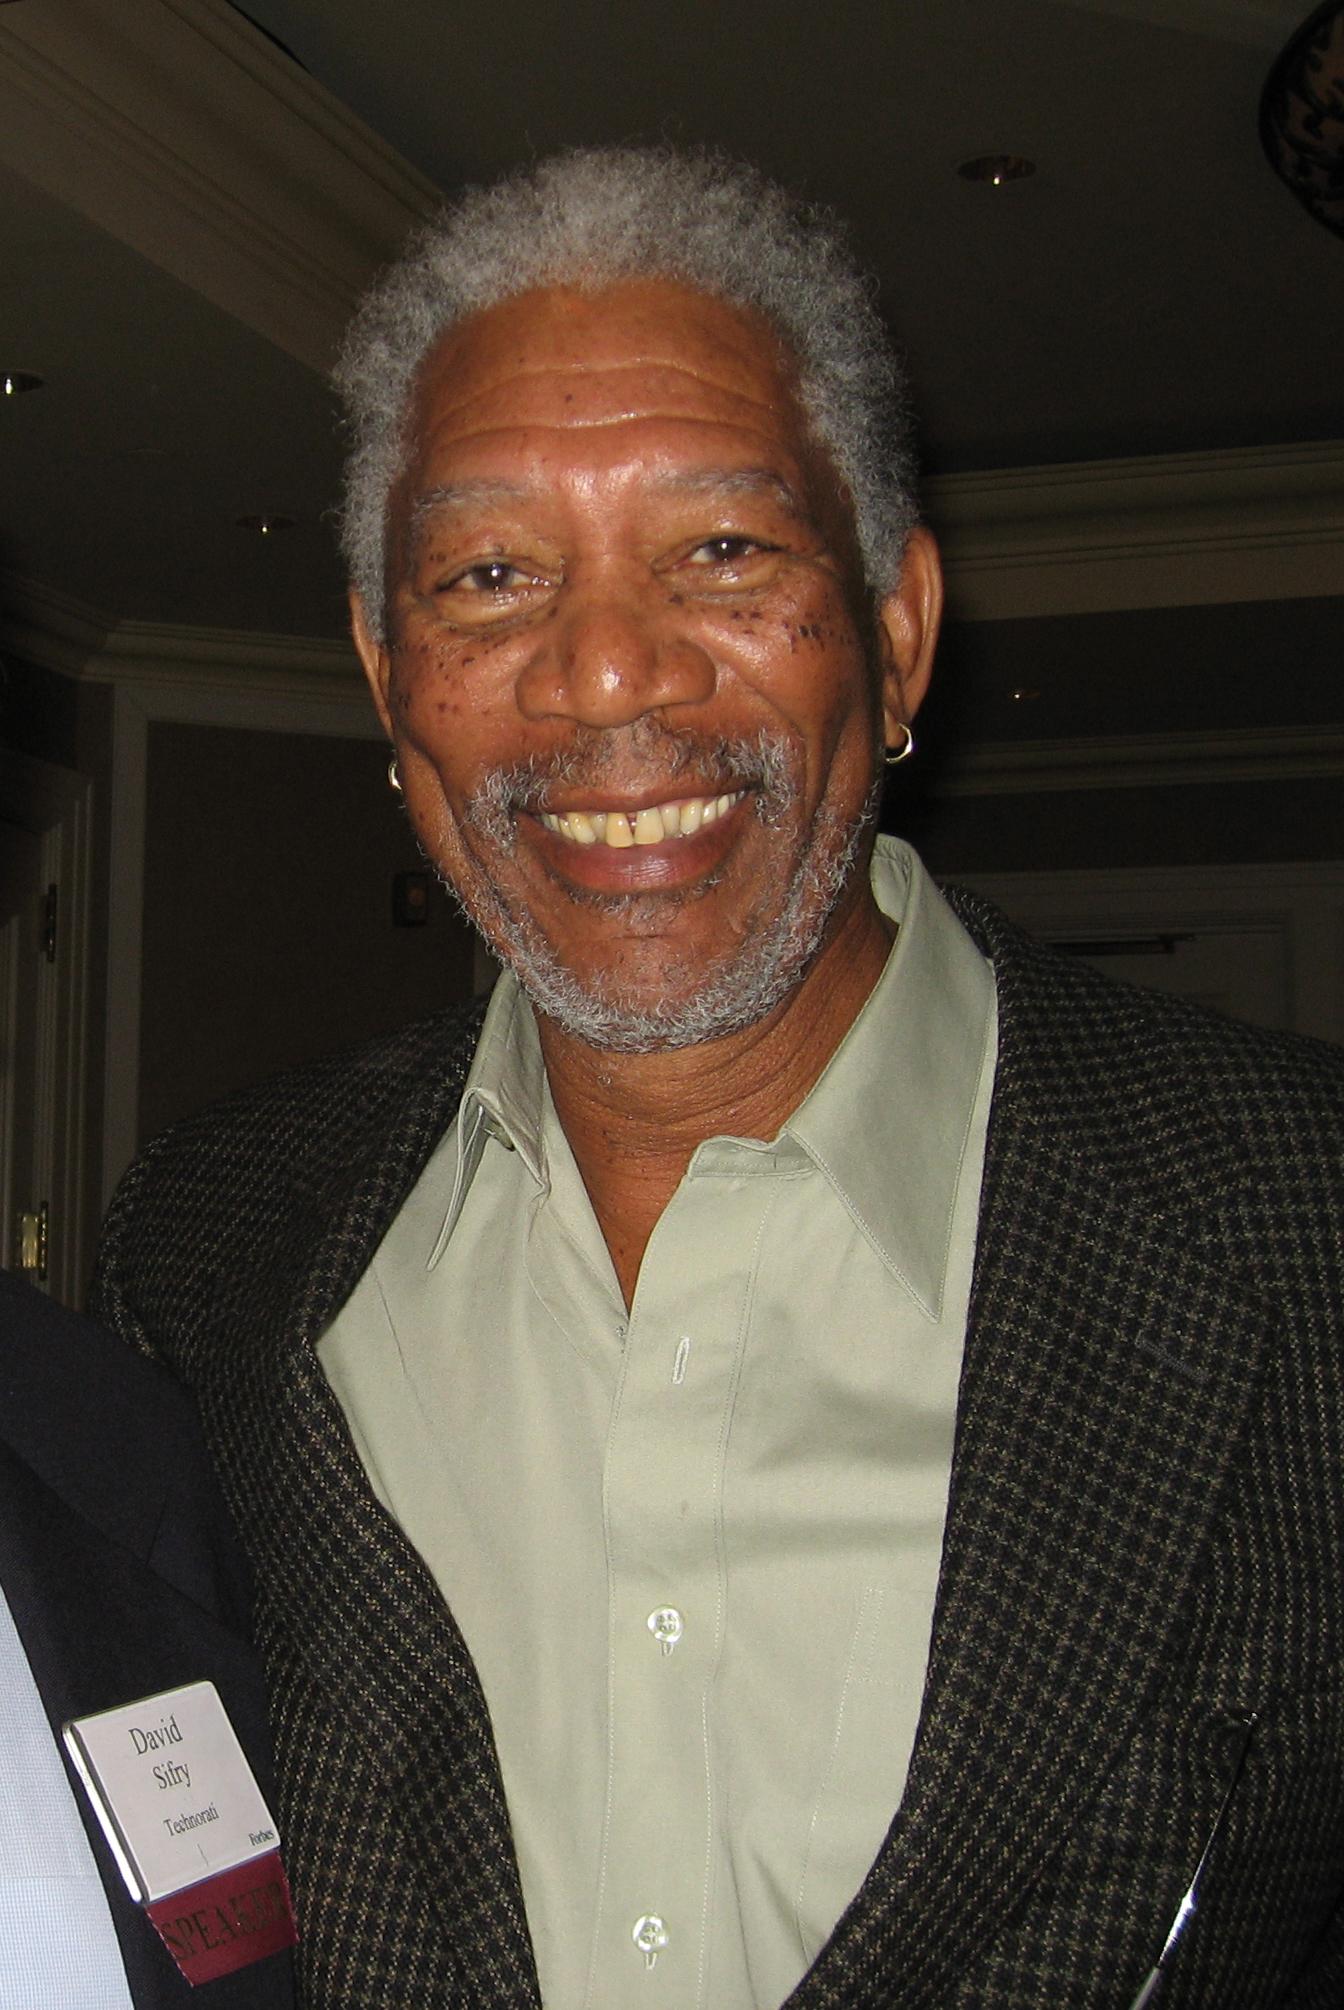 Morgan_Freeman%2C_2006.jpg